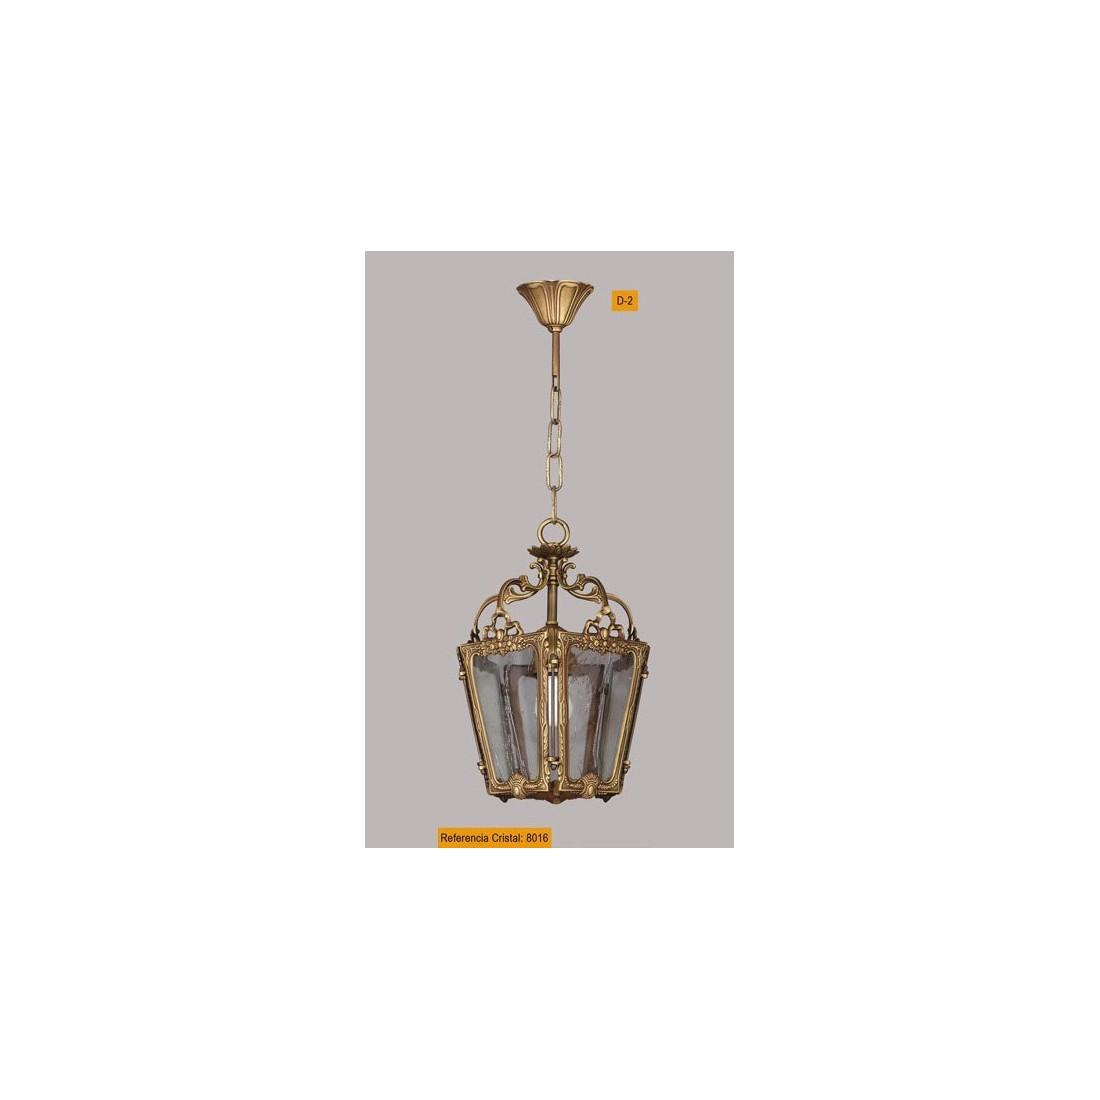 L mpara cl sica de bronce con tulipa de cristal de murano - Lamparas de pasillo ...